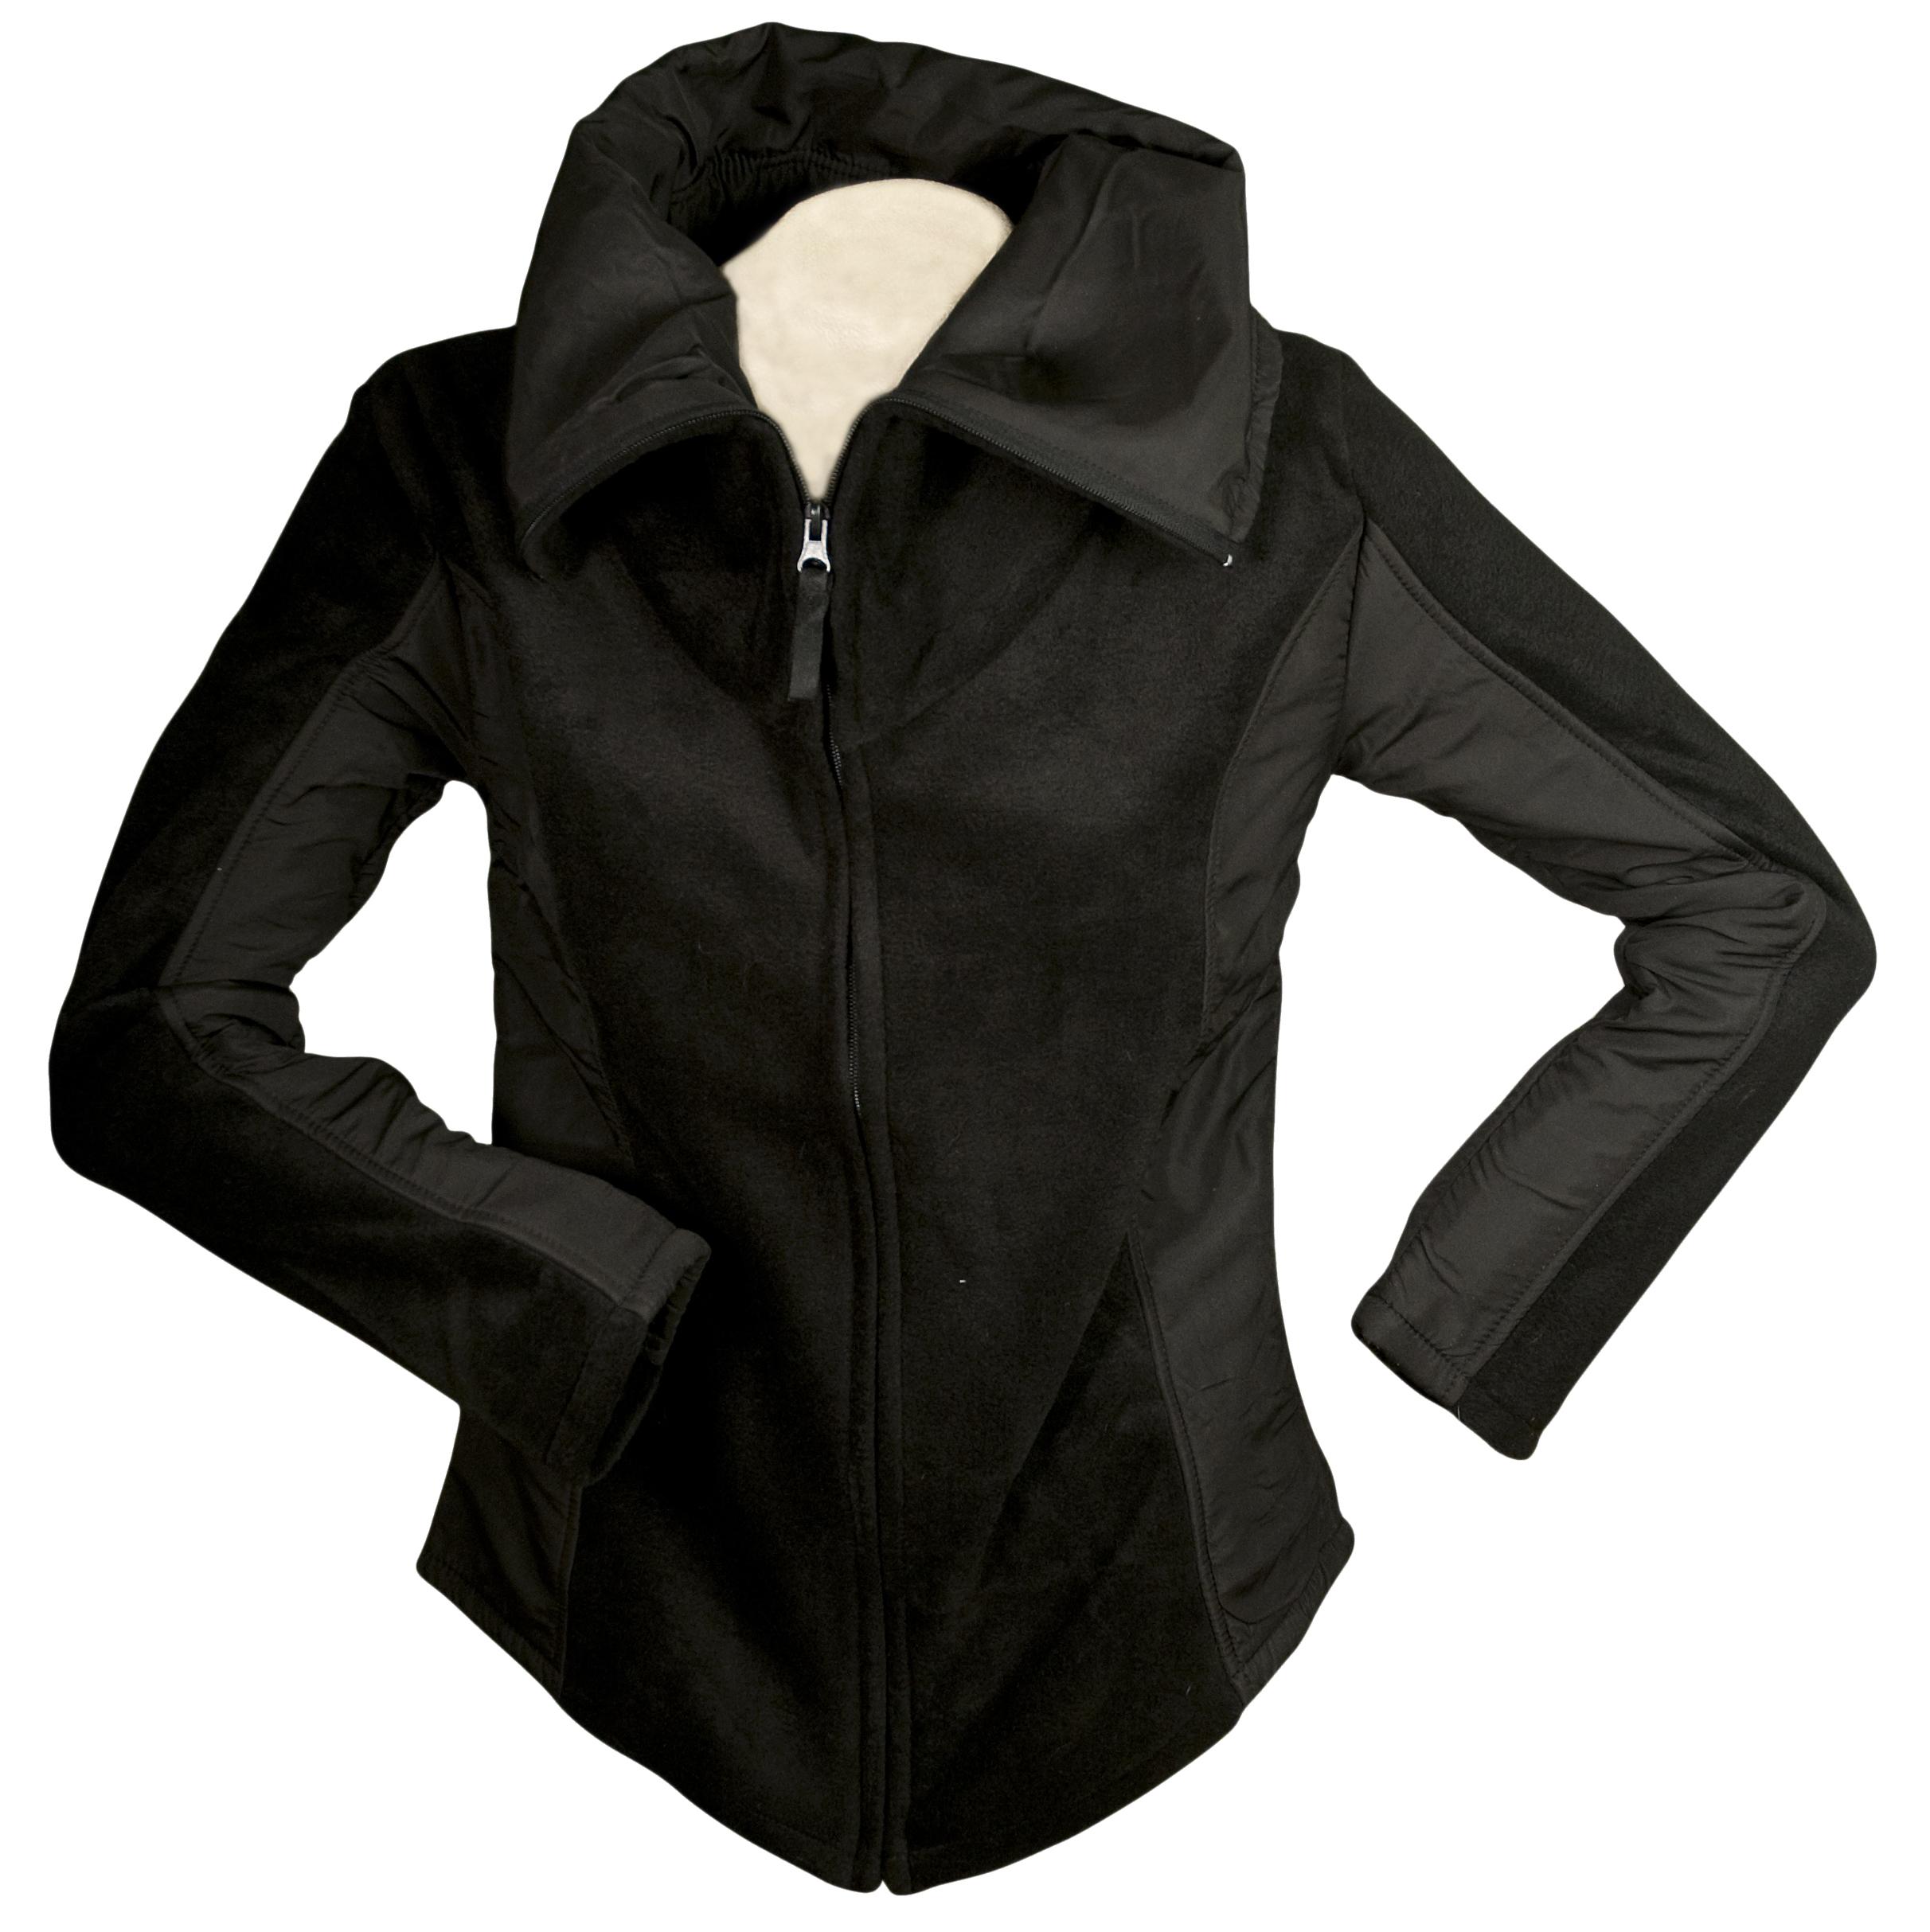 HorseLoverZ Contact 2-Tone Fleece Sports Jacket X-Large Black/Black at Sears.com